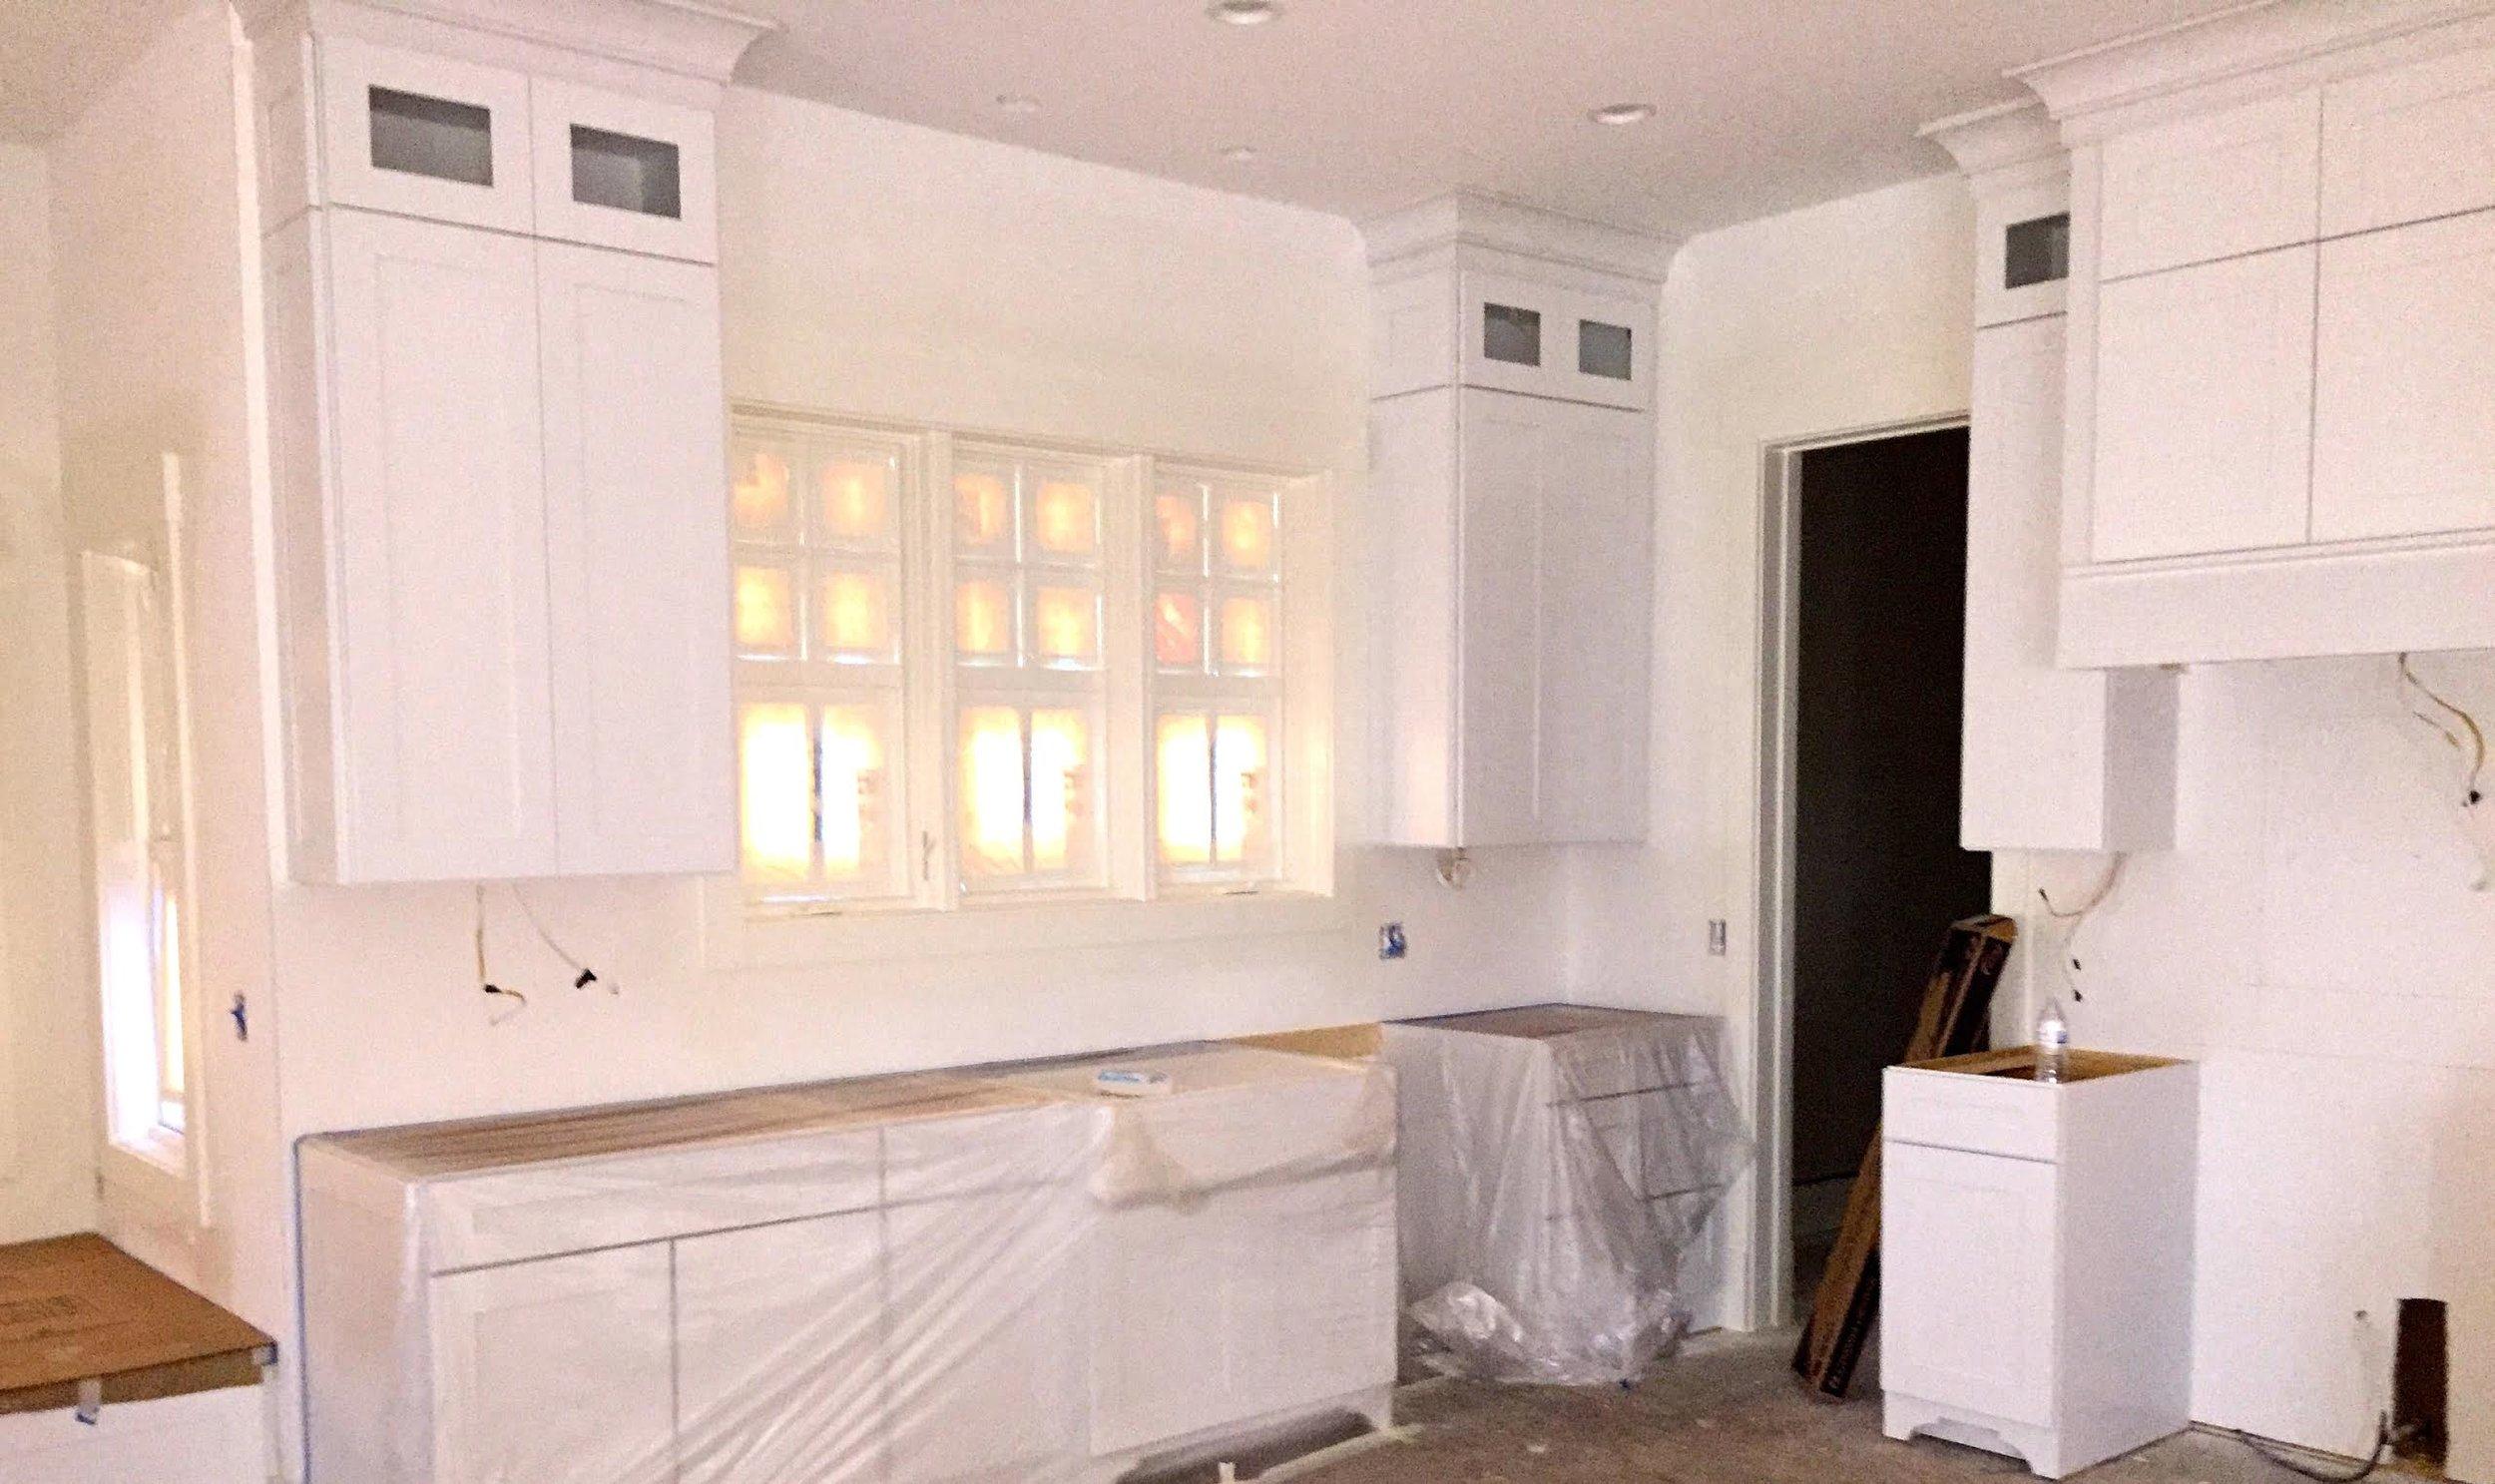 kitchenappliance.jpg